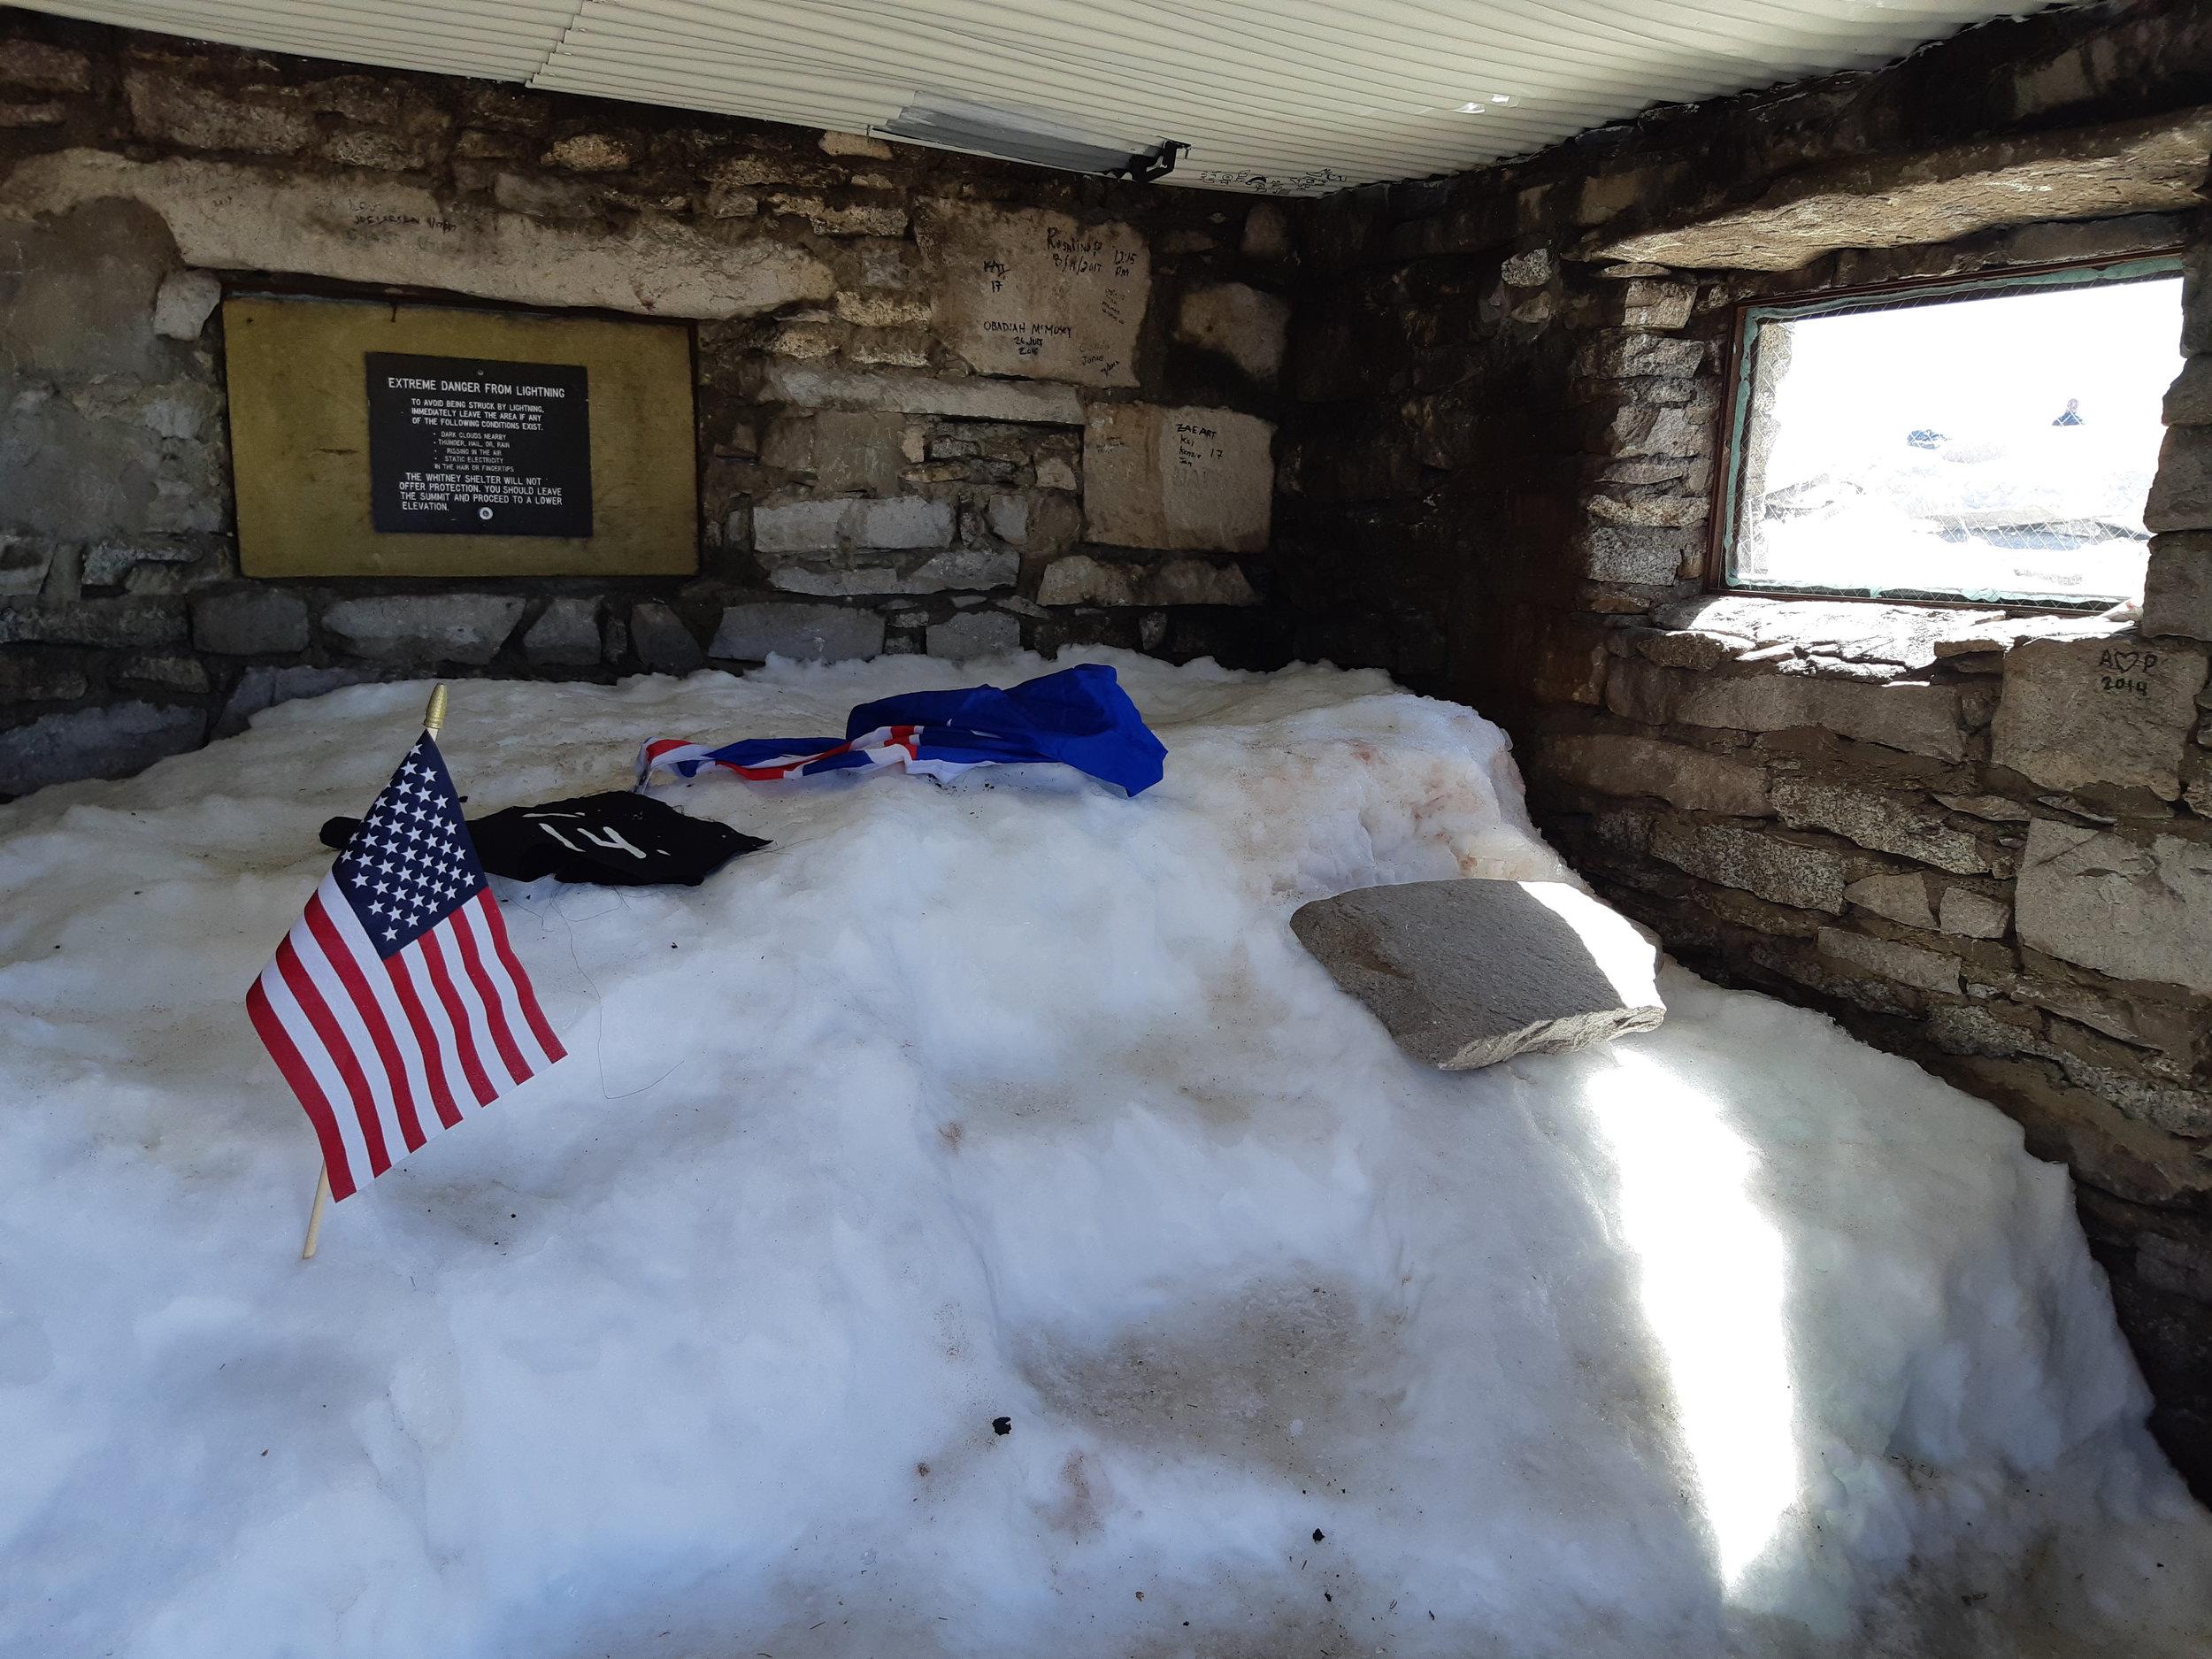 Mount Whitney Shelter 14,505 ft